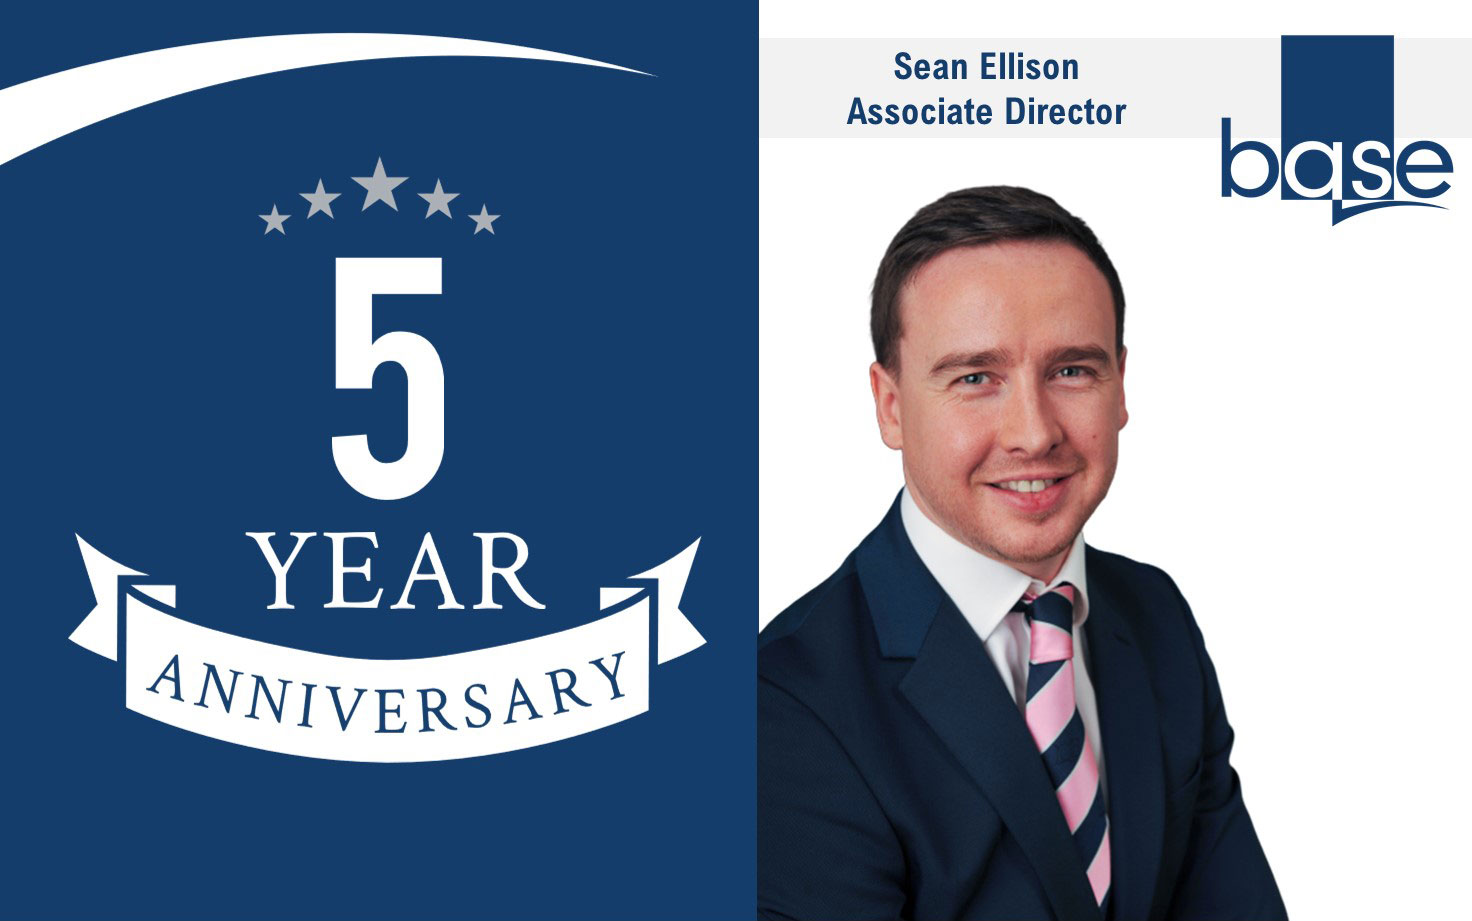 Happy 5th anniversary Sean Ellison